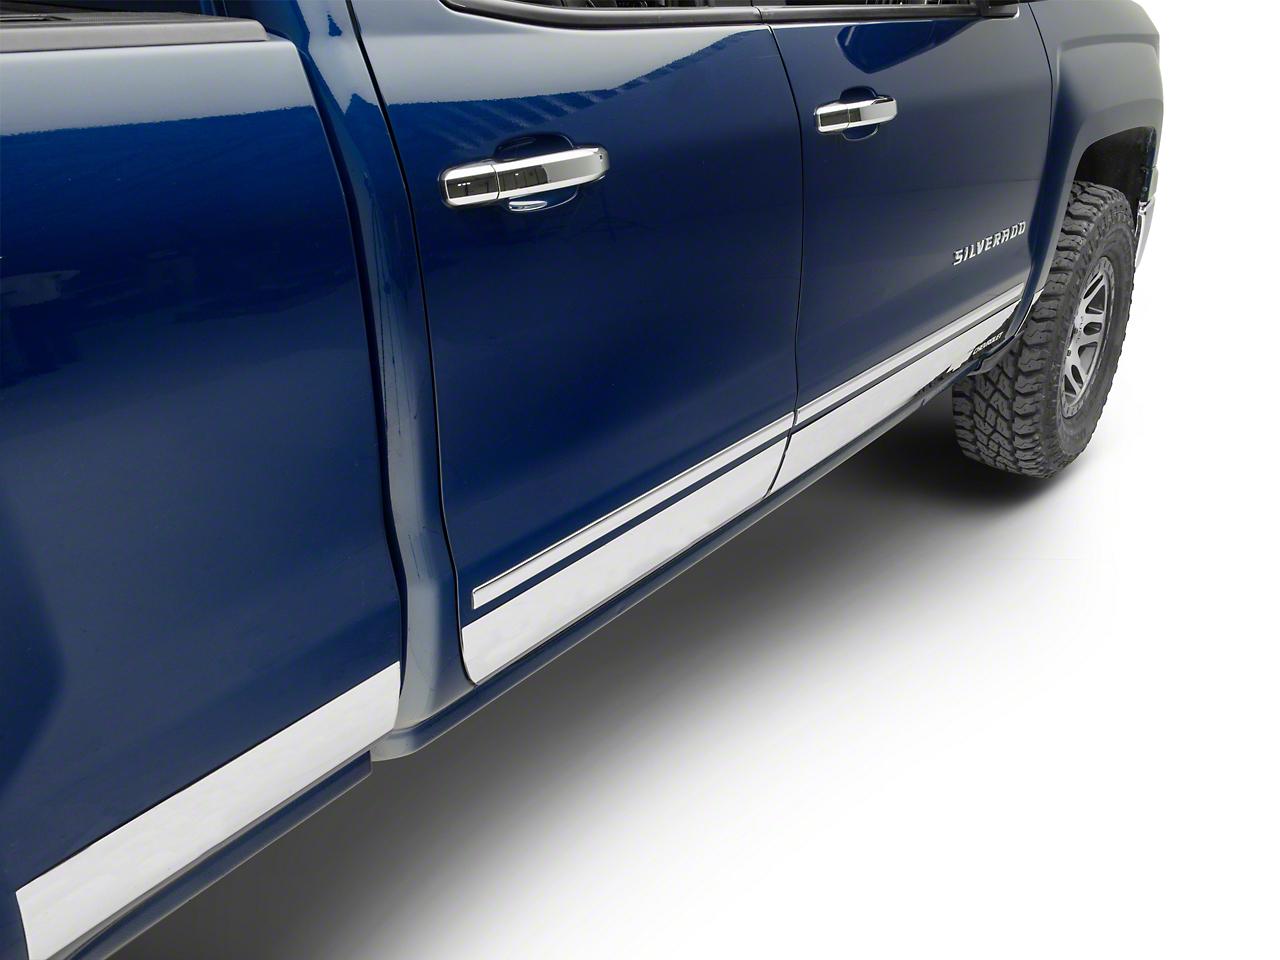 Putco Stainless Steel Rocker Panels w/ Bowtie Logo (14-18 Silverado 1500)